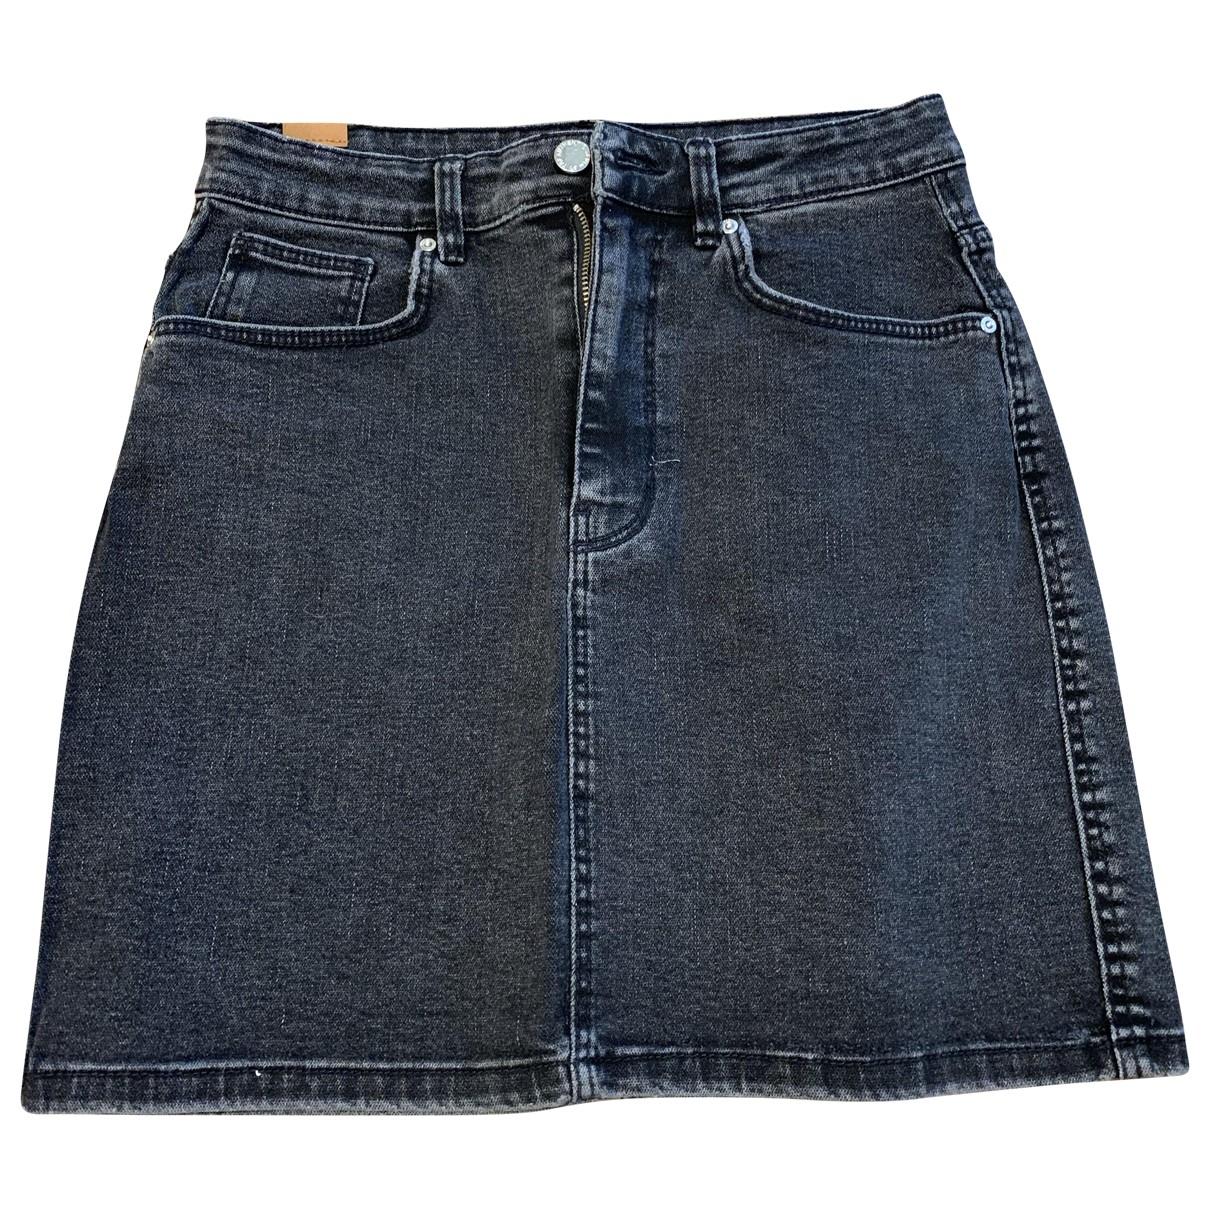 Zara - Jupe   pour femme en coton - elasthane - anthracite